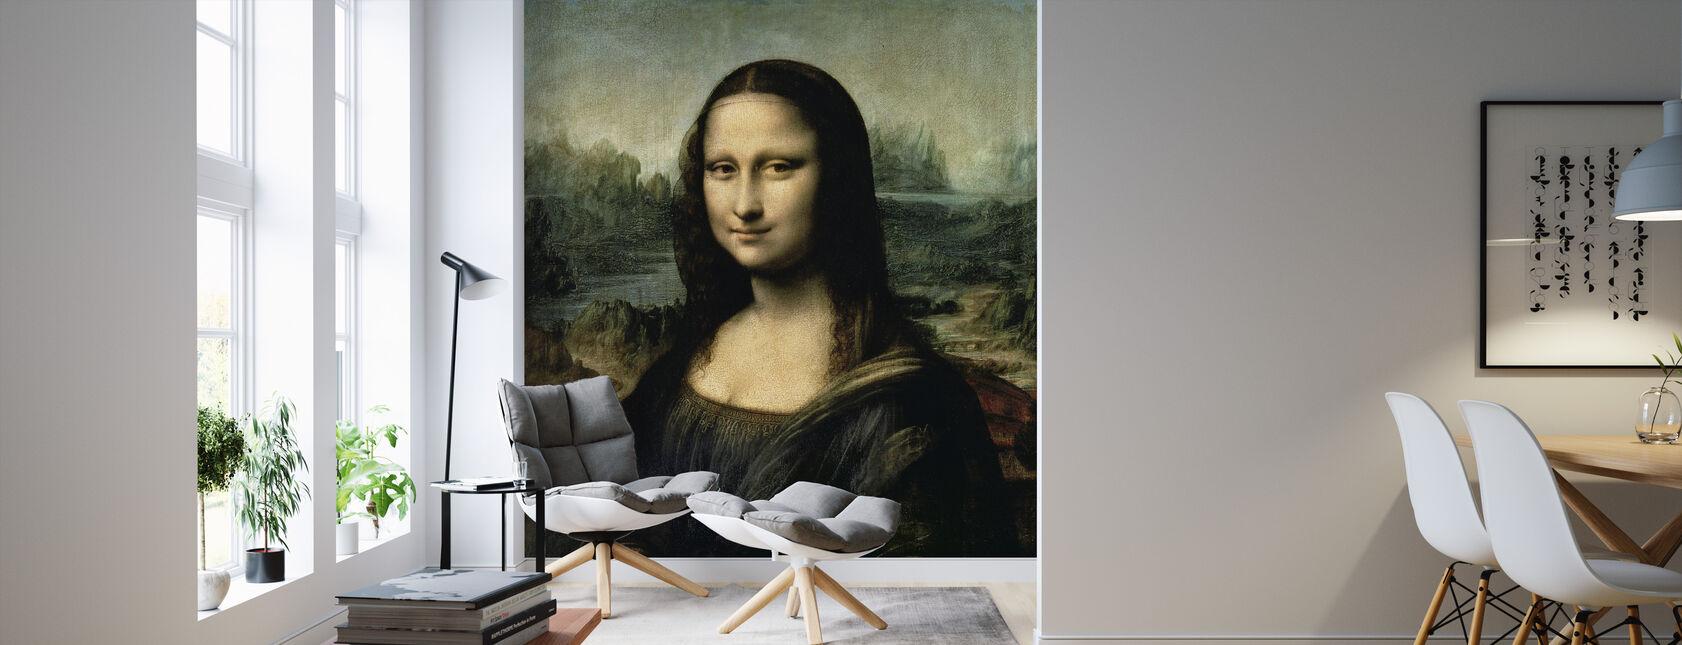 Mona Lisa, Leonardo da Vinci - Tapet - Stue